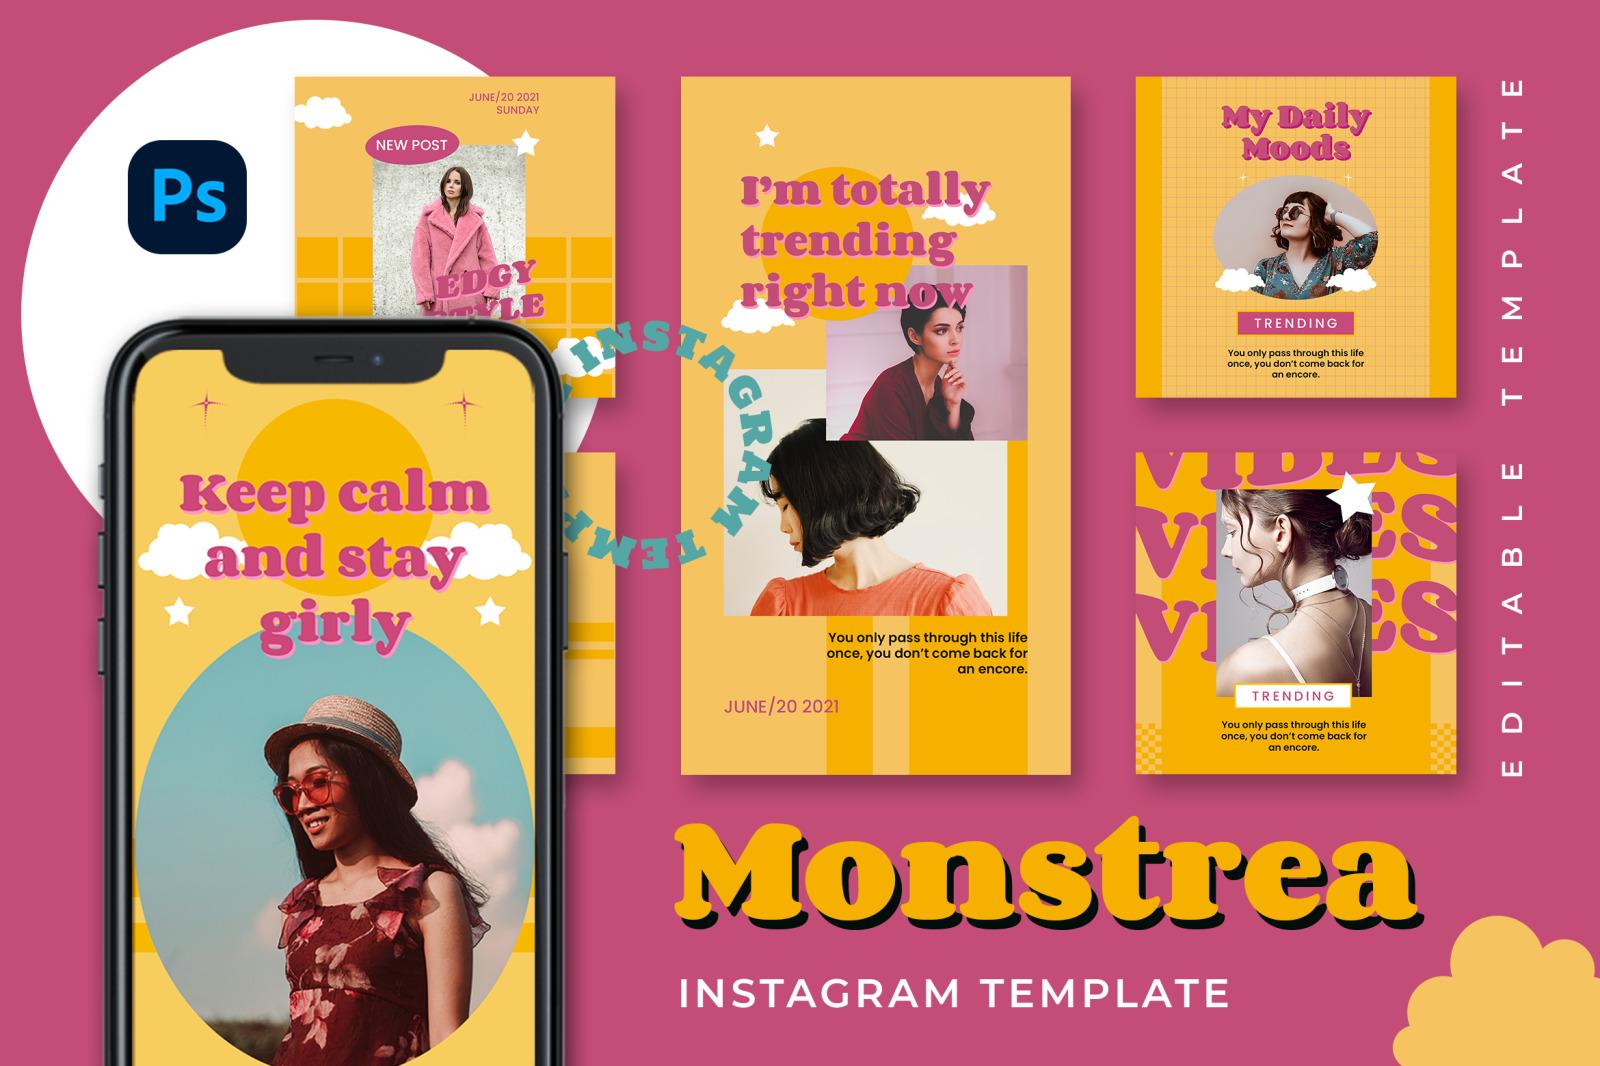 Monstrea Instagram Template